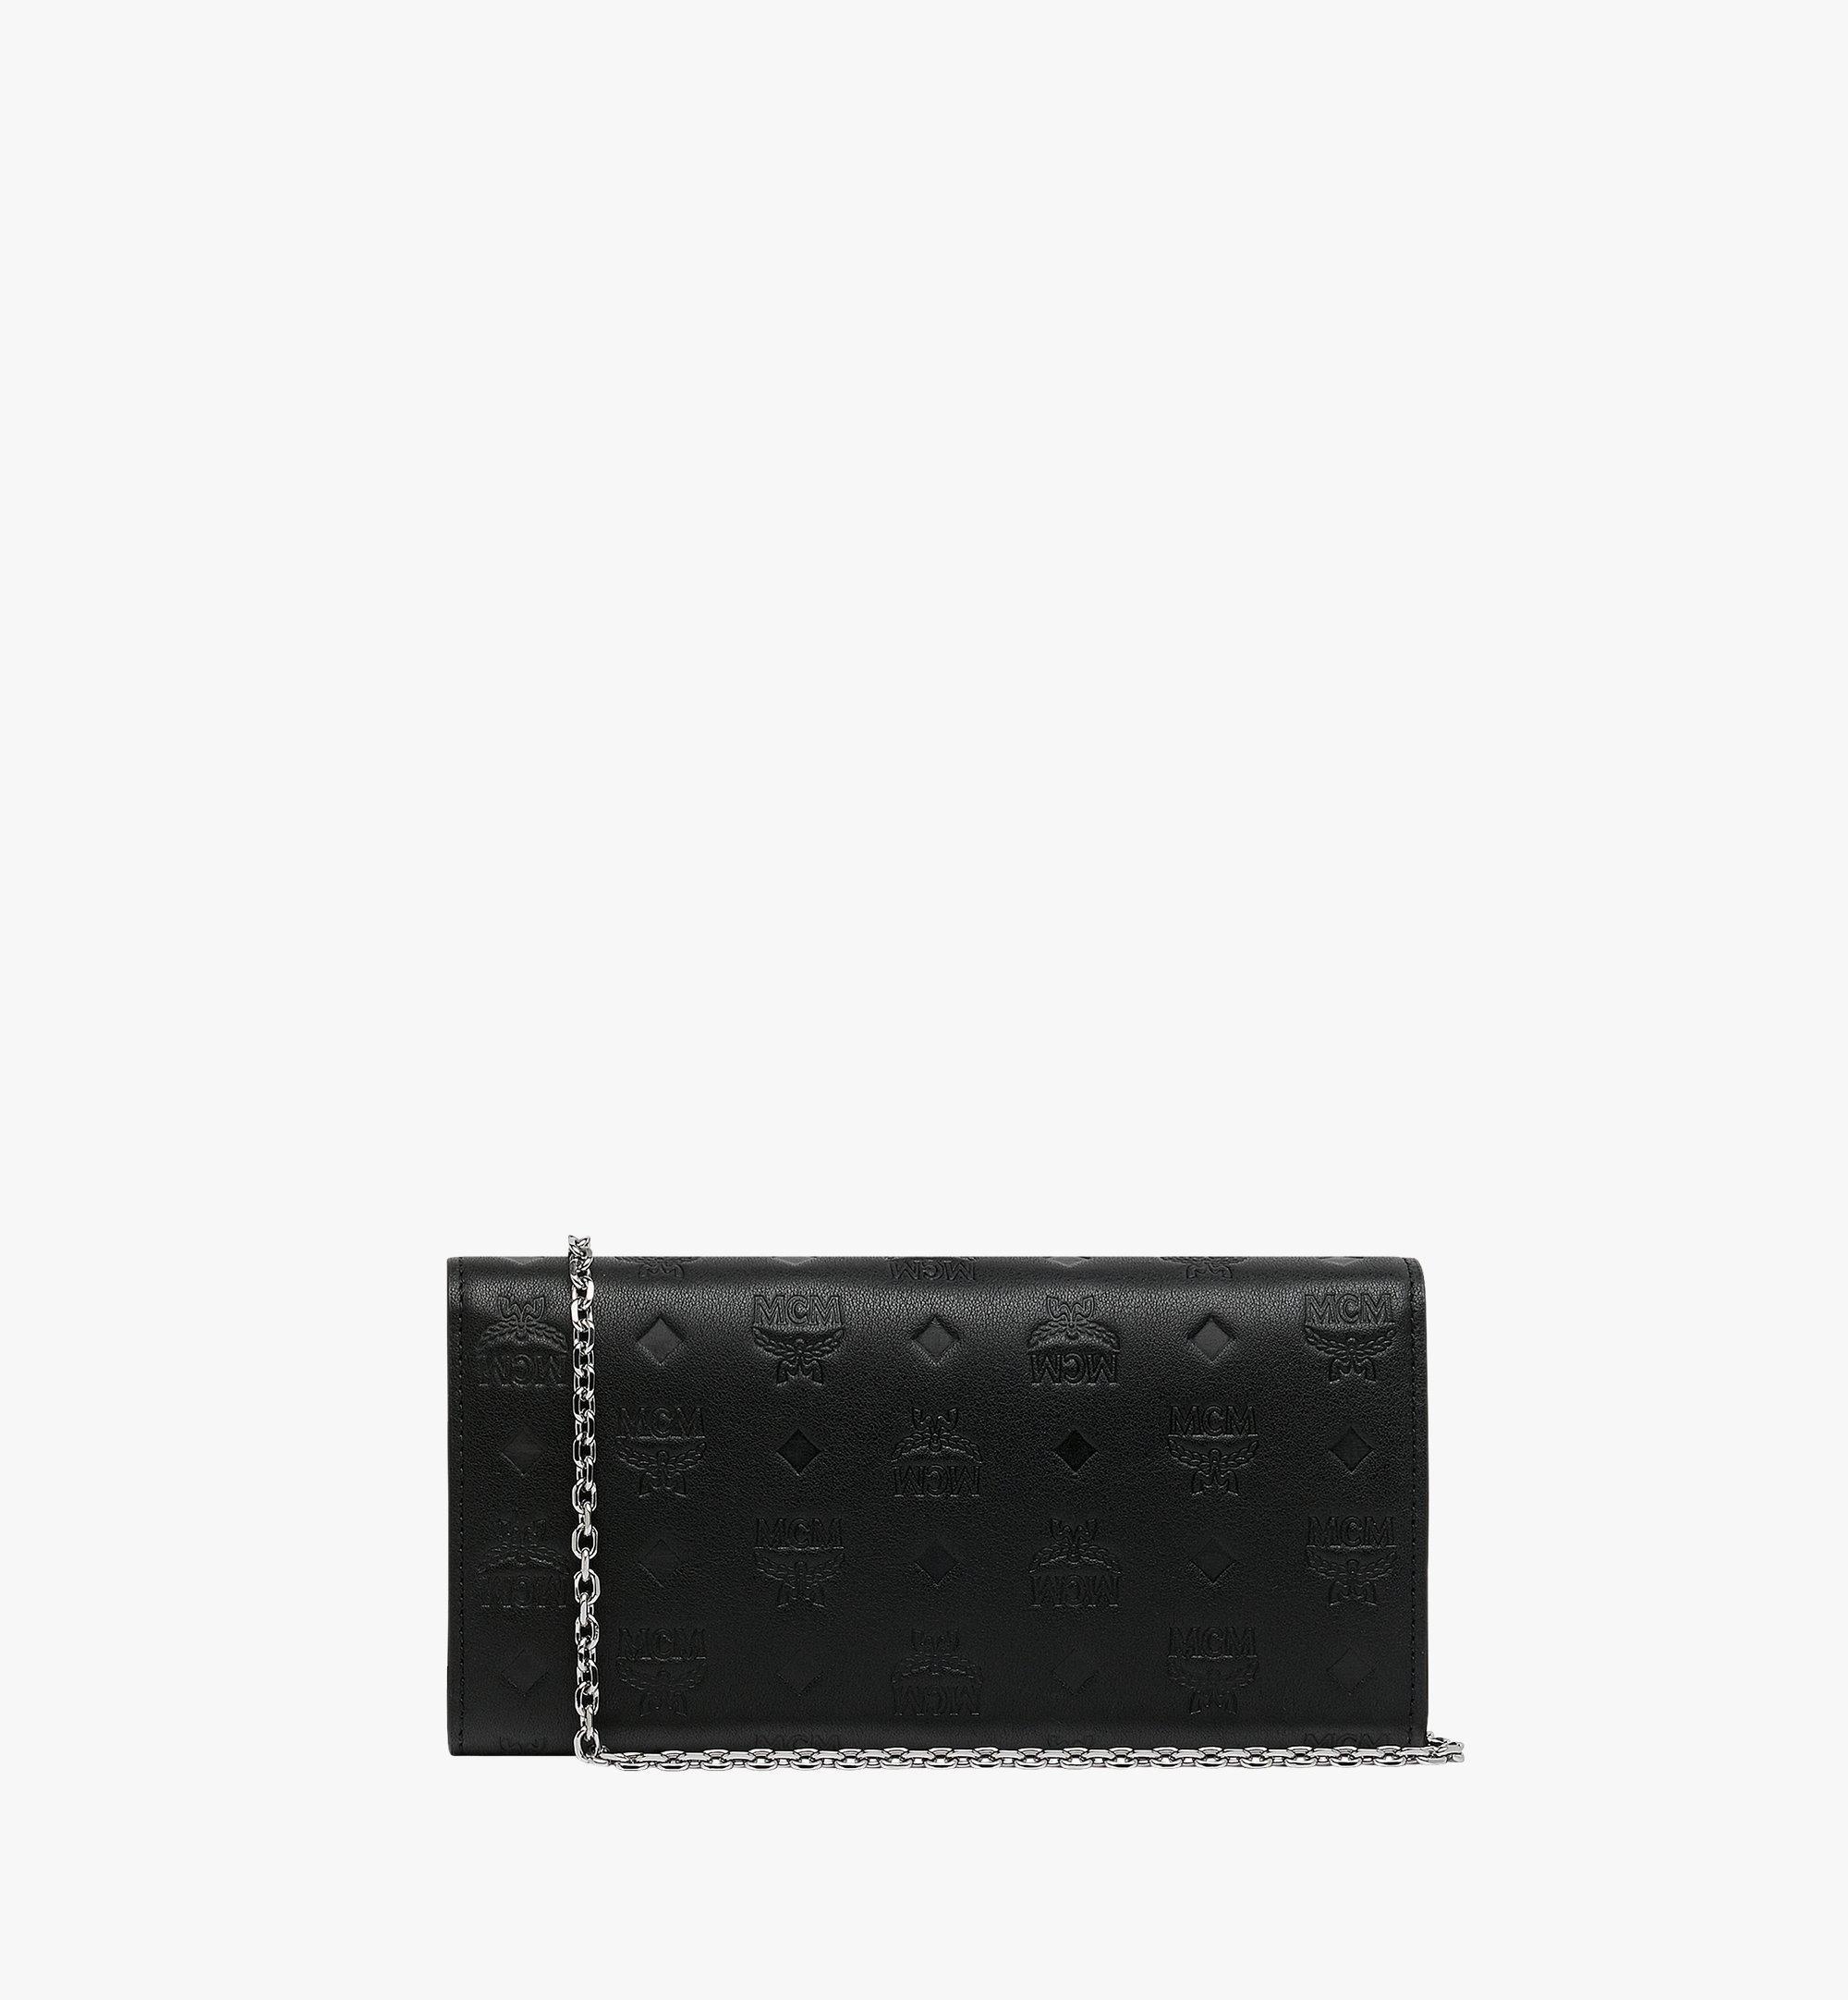 MCM Patricia Crossbody Wallet in Monogram Leather Black MYL9SPA55BK001 Alternate View 2